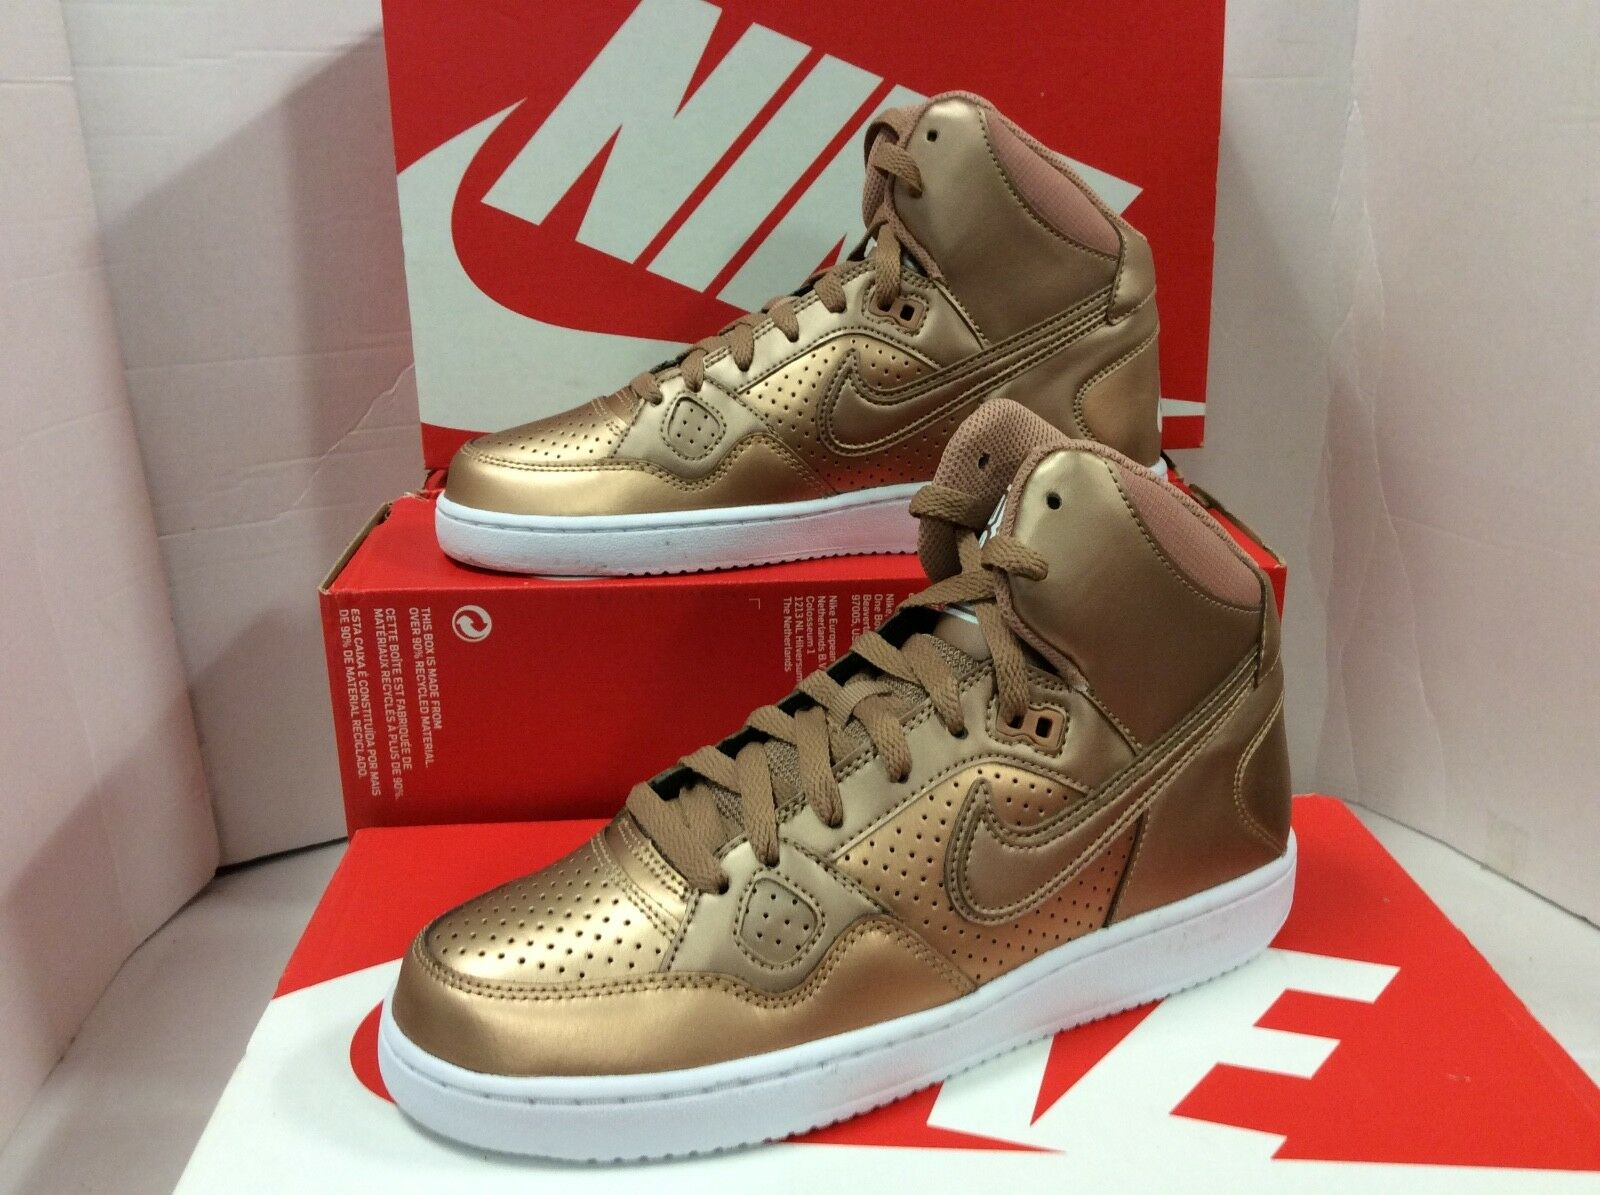 Nike Son of Force Damenschuhe Mid Trainers, Größe UK 5 / EU 38.5